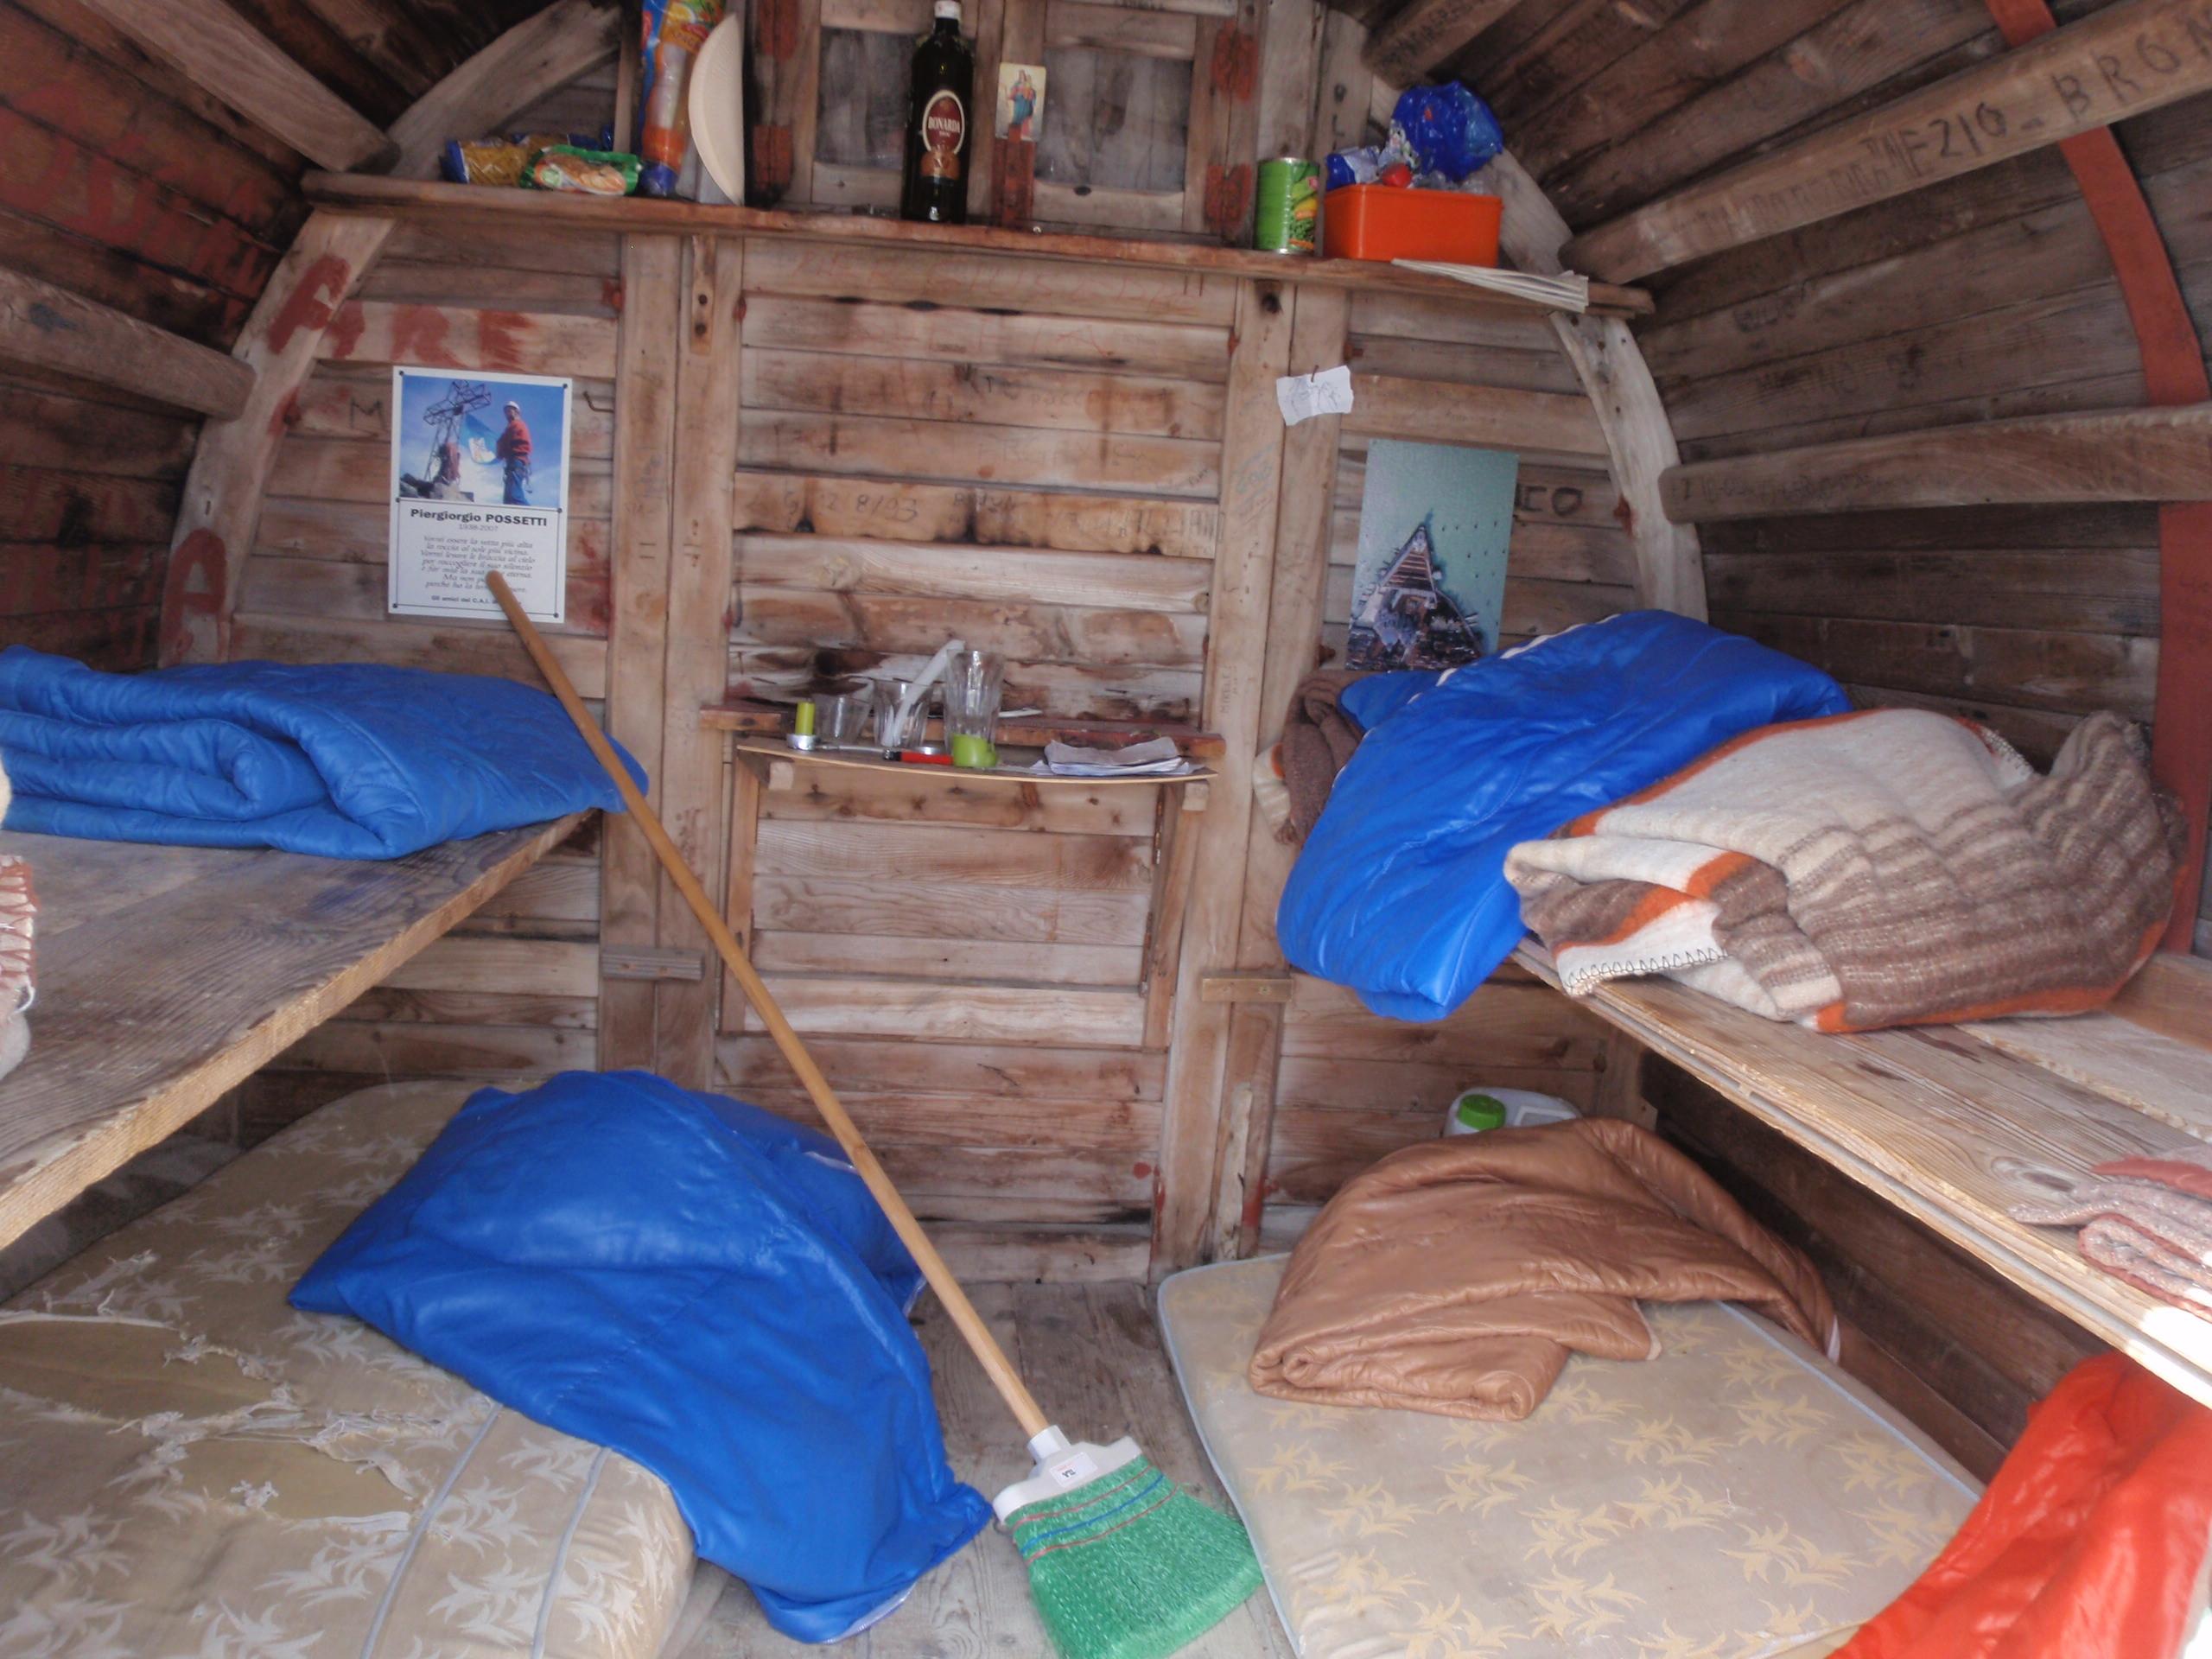 bivouac dei amici del cai cavour ou bivouac de la pointe de venise. Black Bedroom Furniture Sets. Home Design Ideas